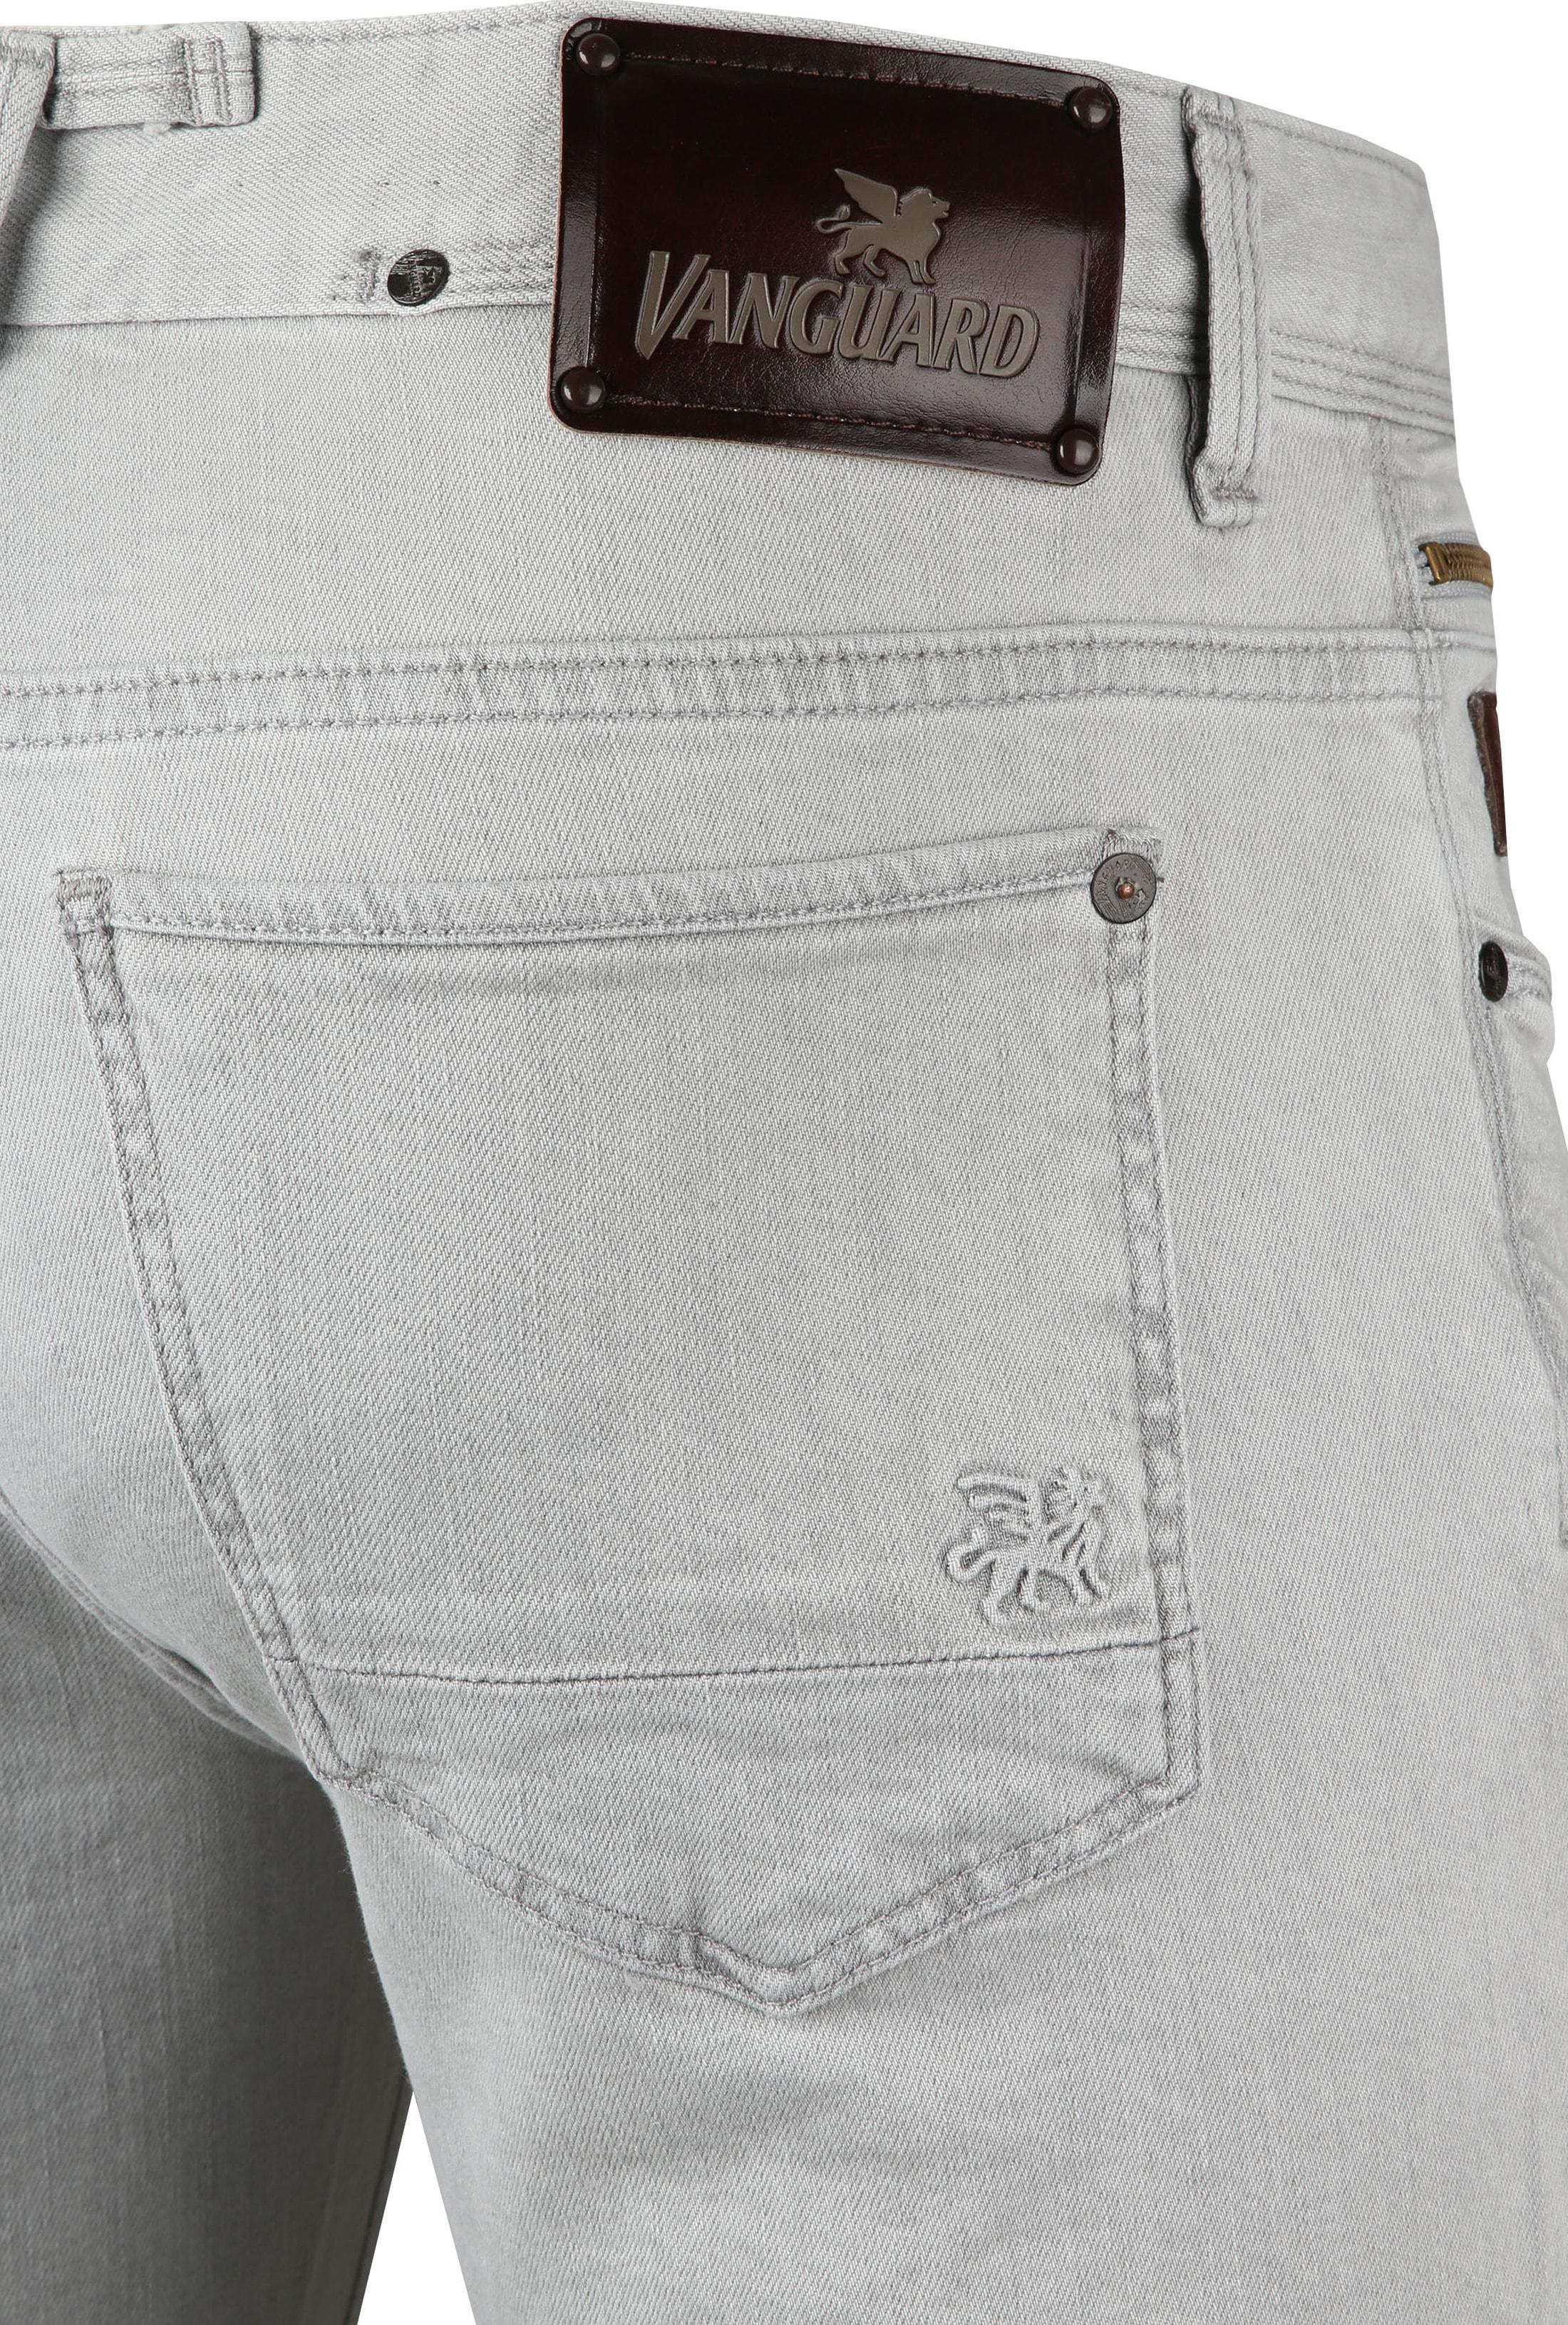 Vanguard V850 Rider Jeans Grau foto 1